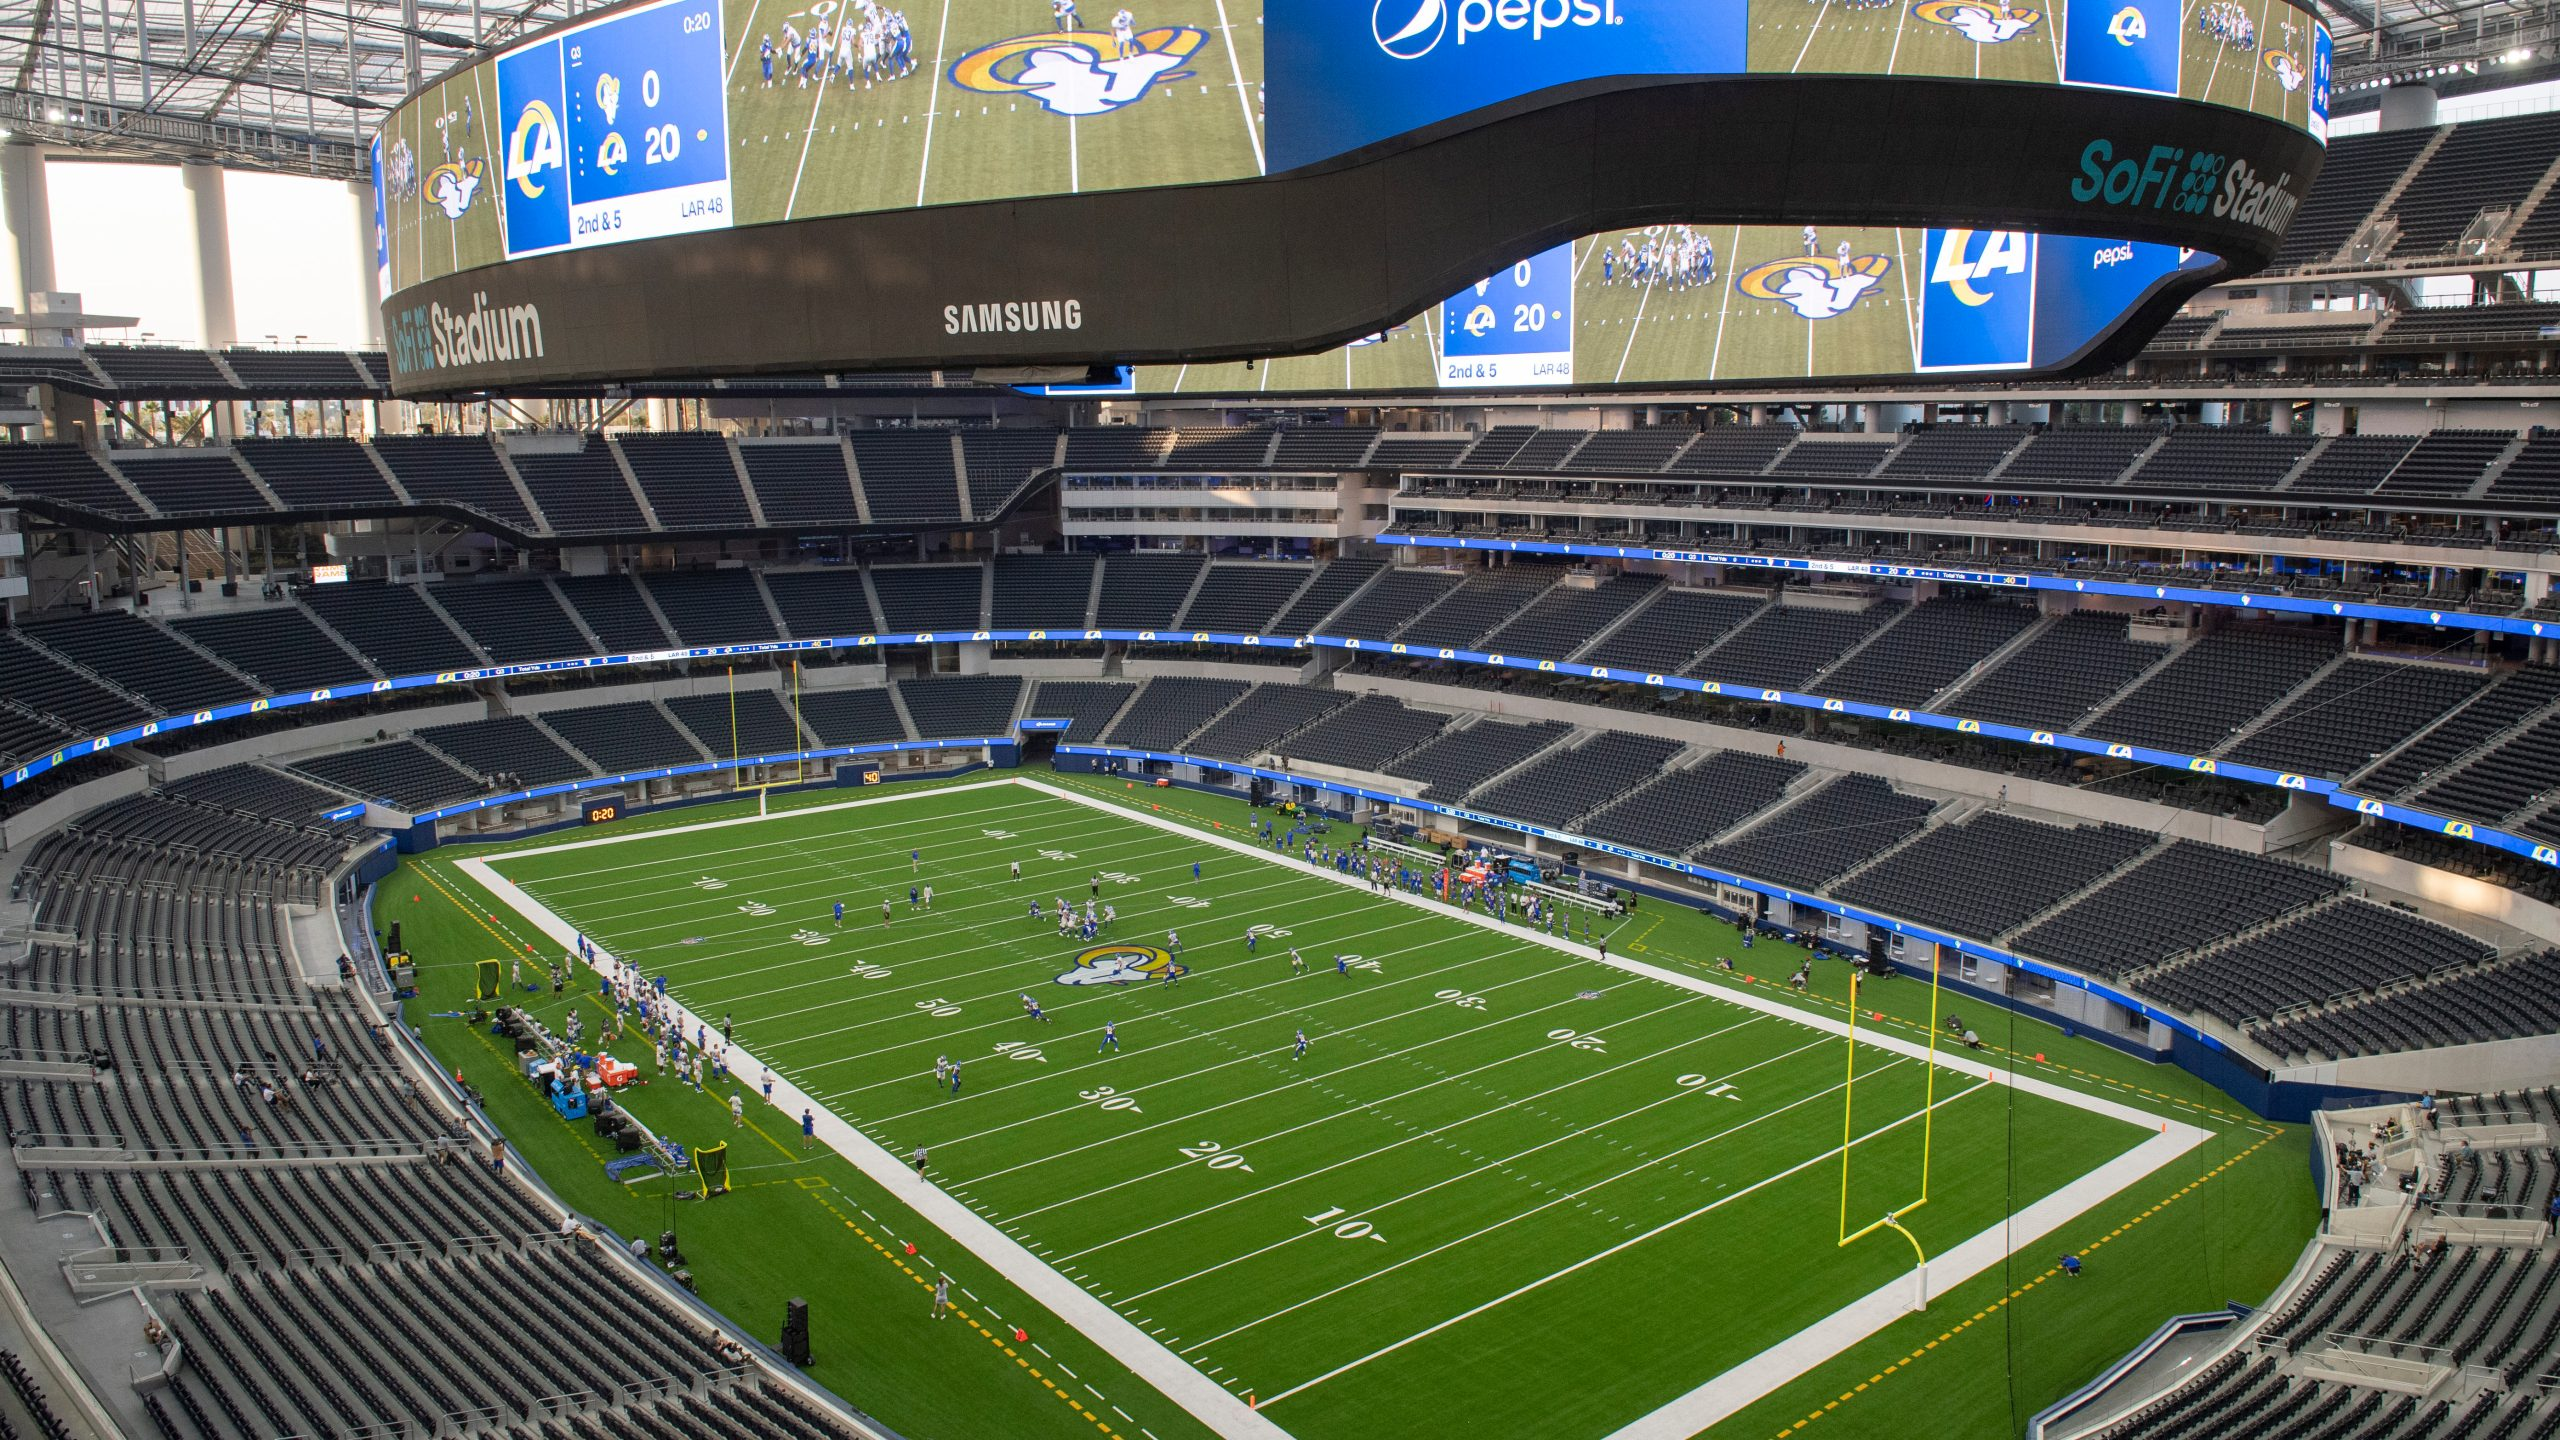 Palace Preview Rams Marvel At 1st Trip To New Sofi Stadium Wfxrtv